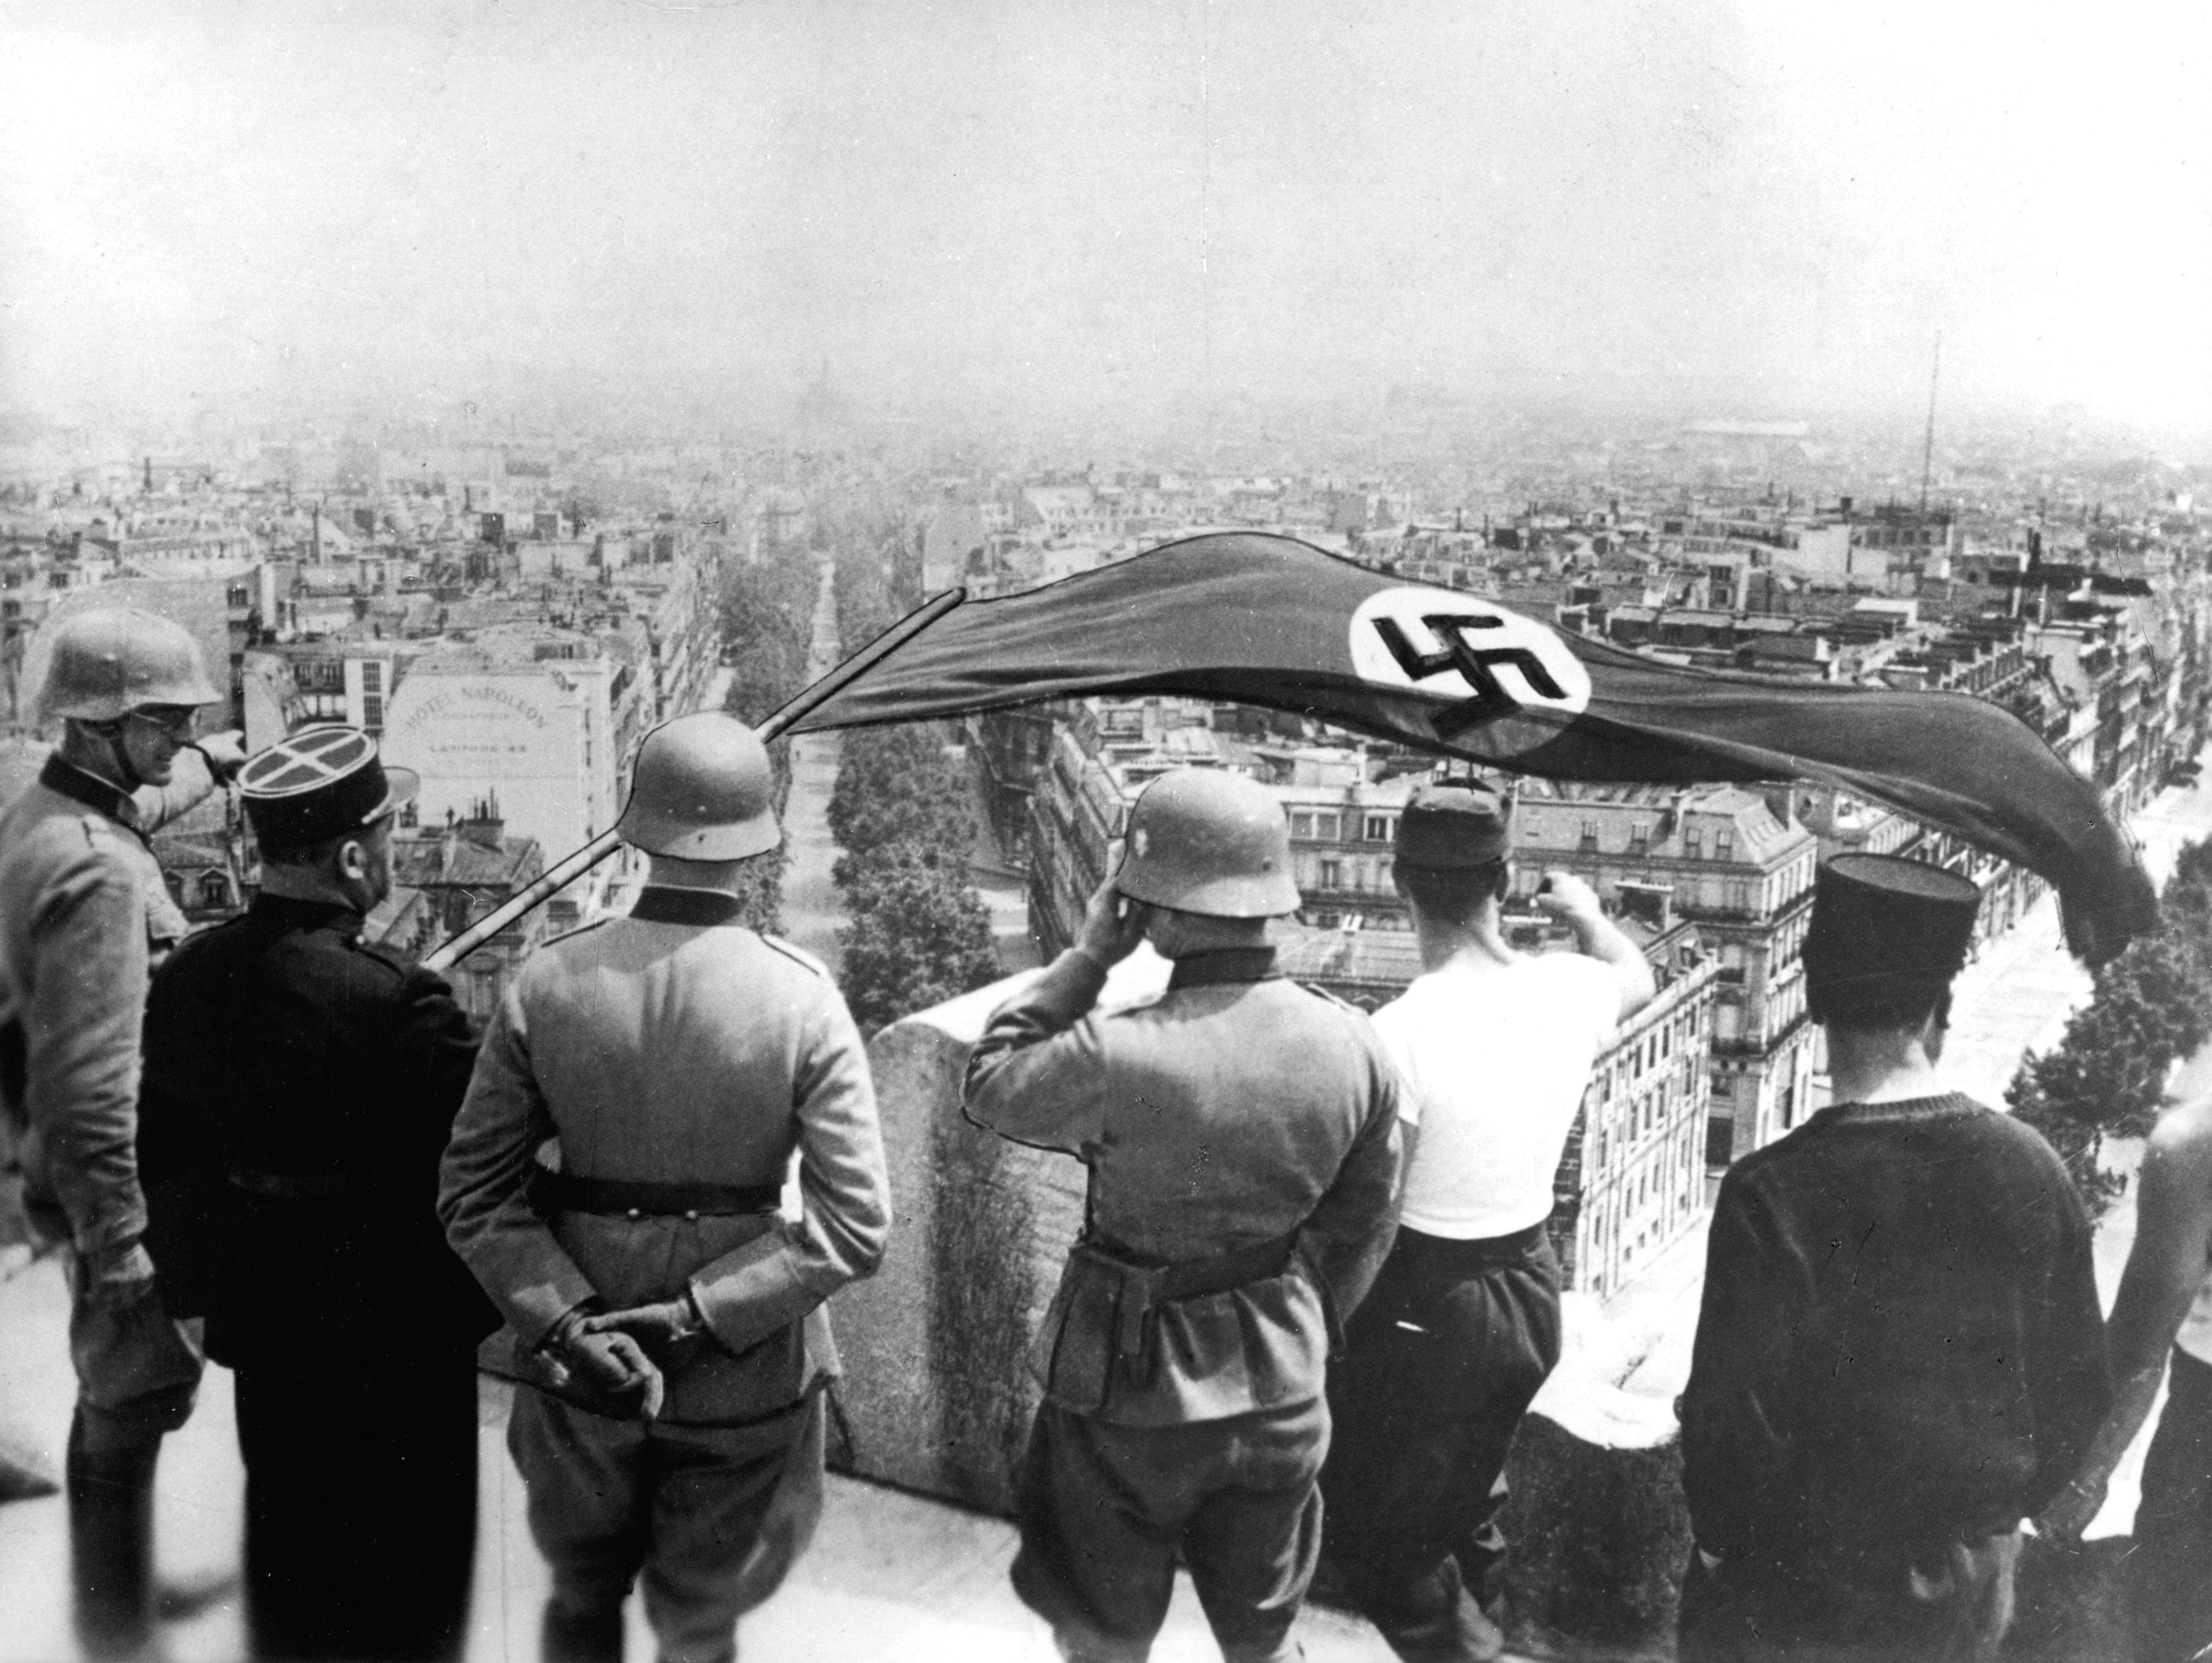 German occupation of Paris, World War II, June 1940. Artist: Anon